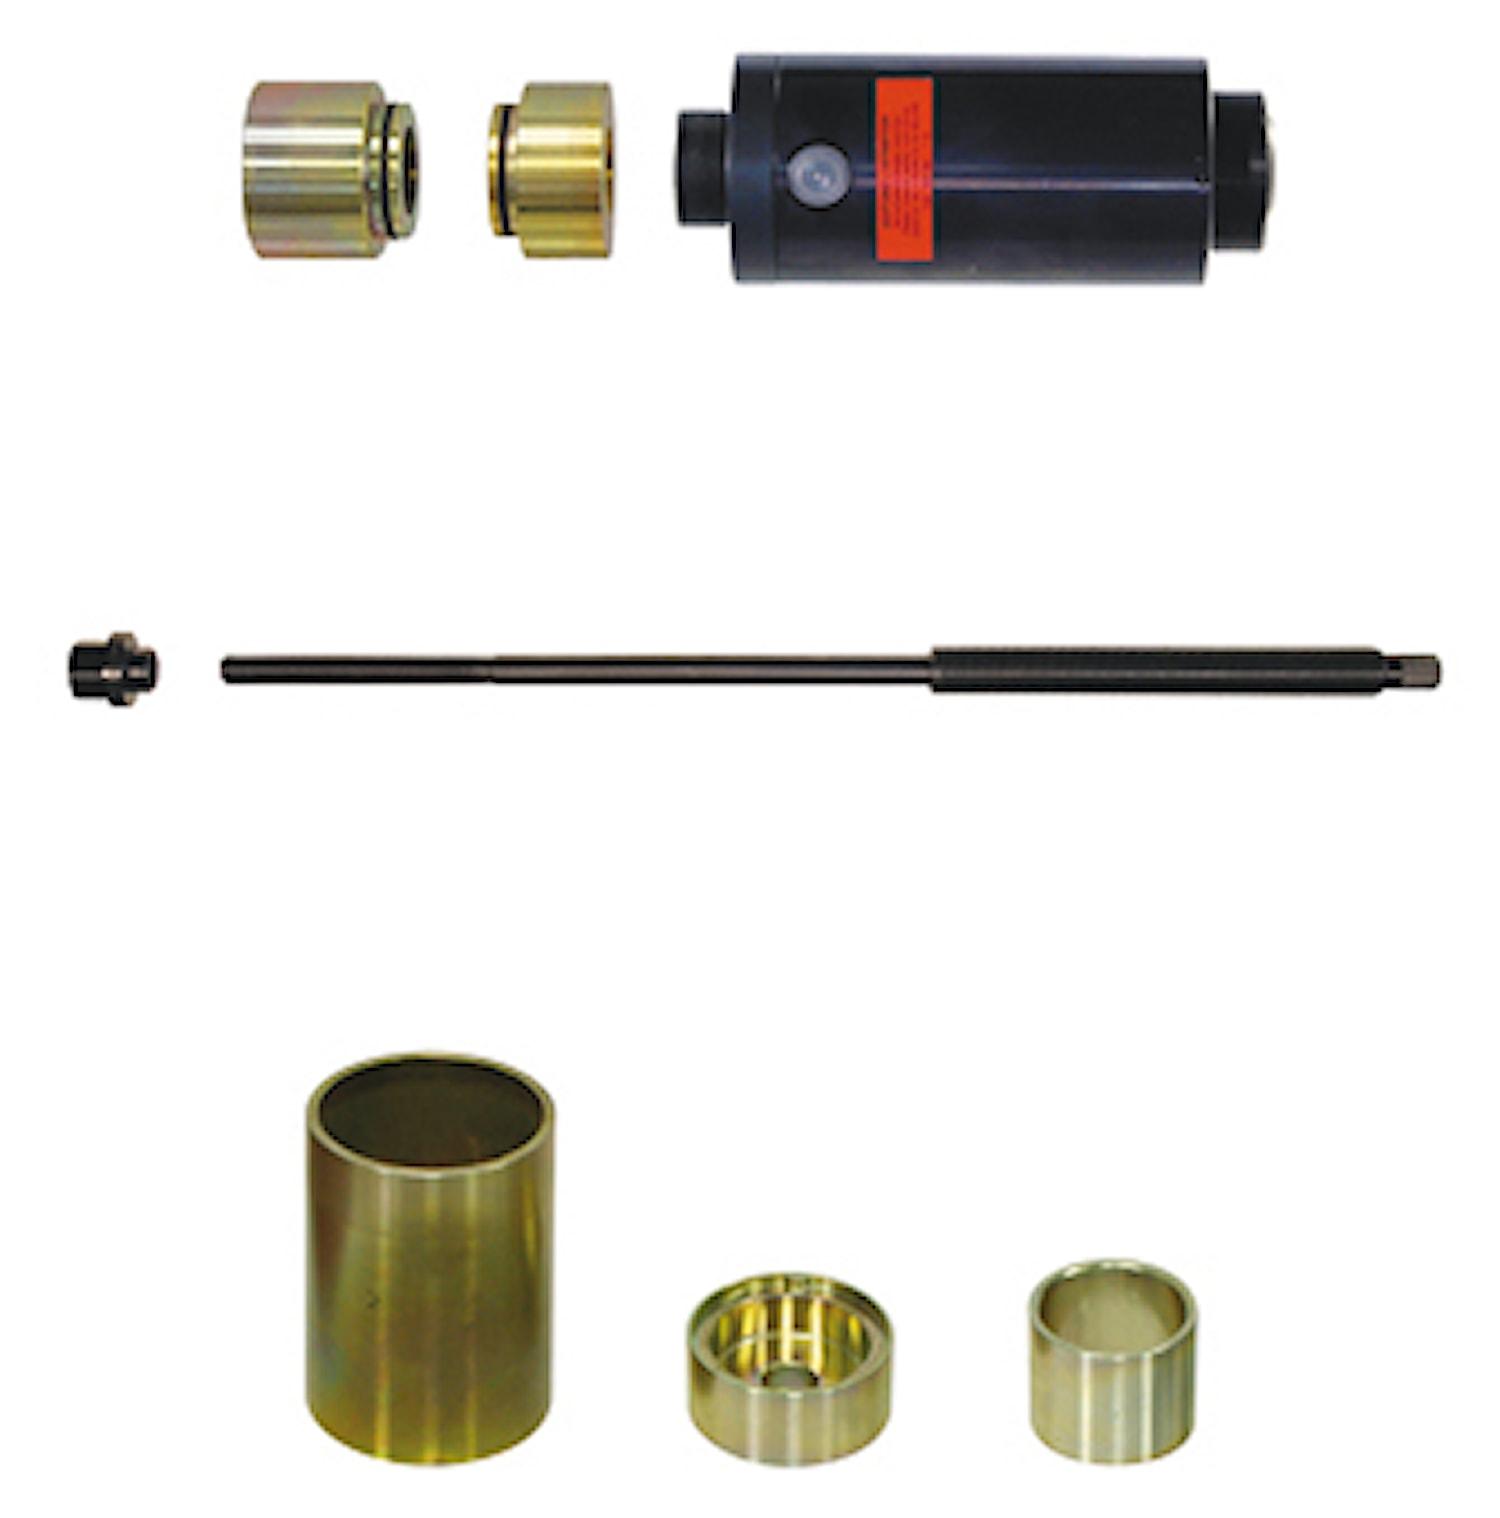 Dragverktyg med hydr. Cyl